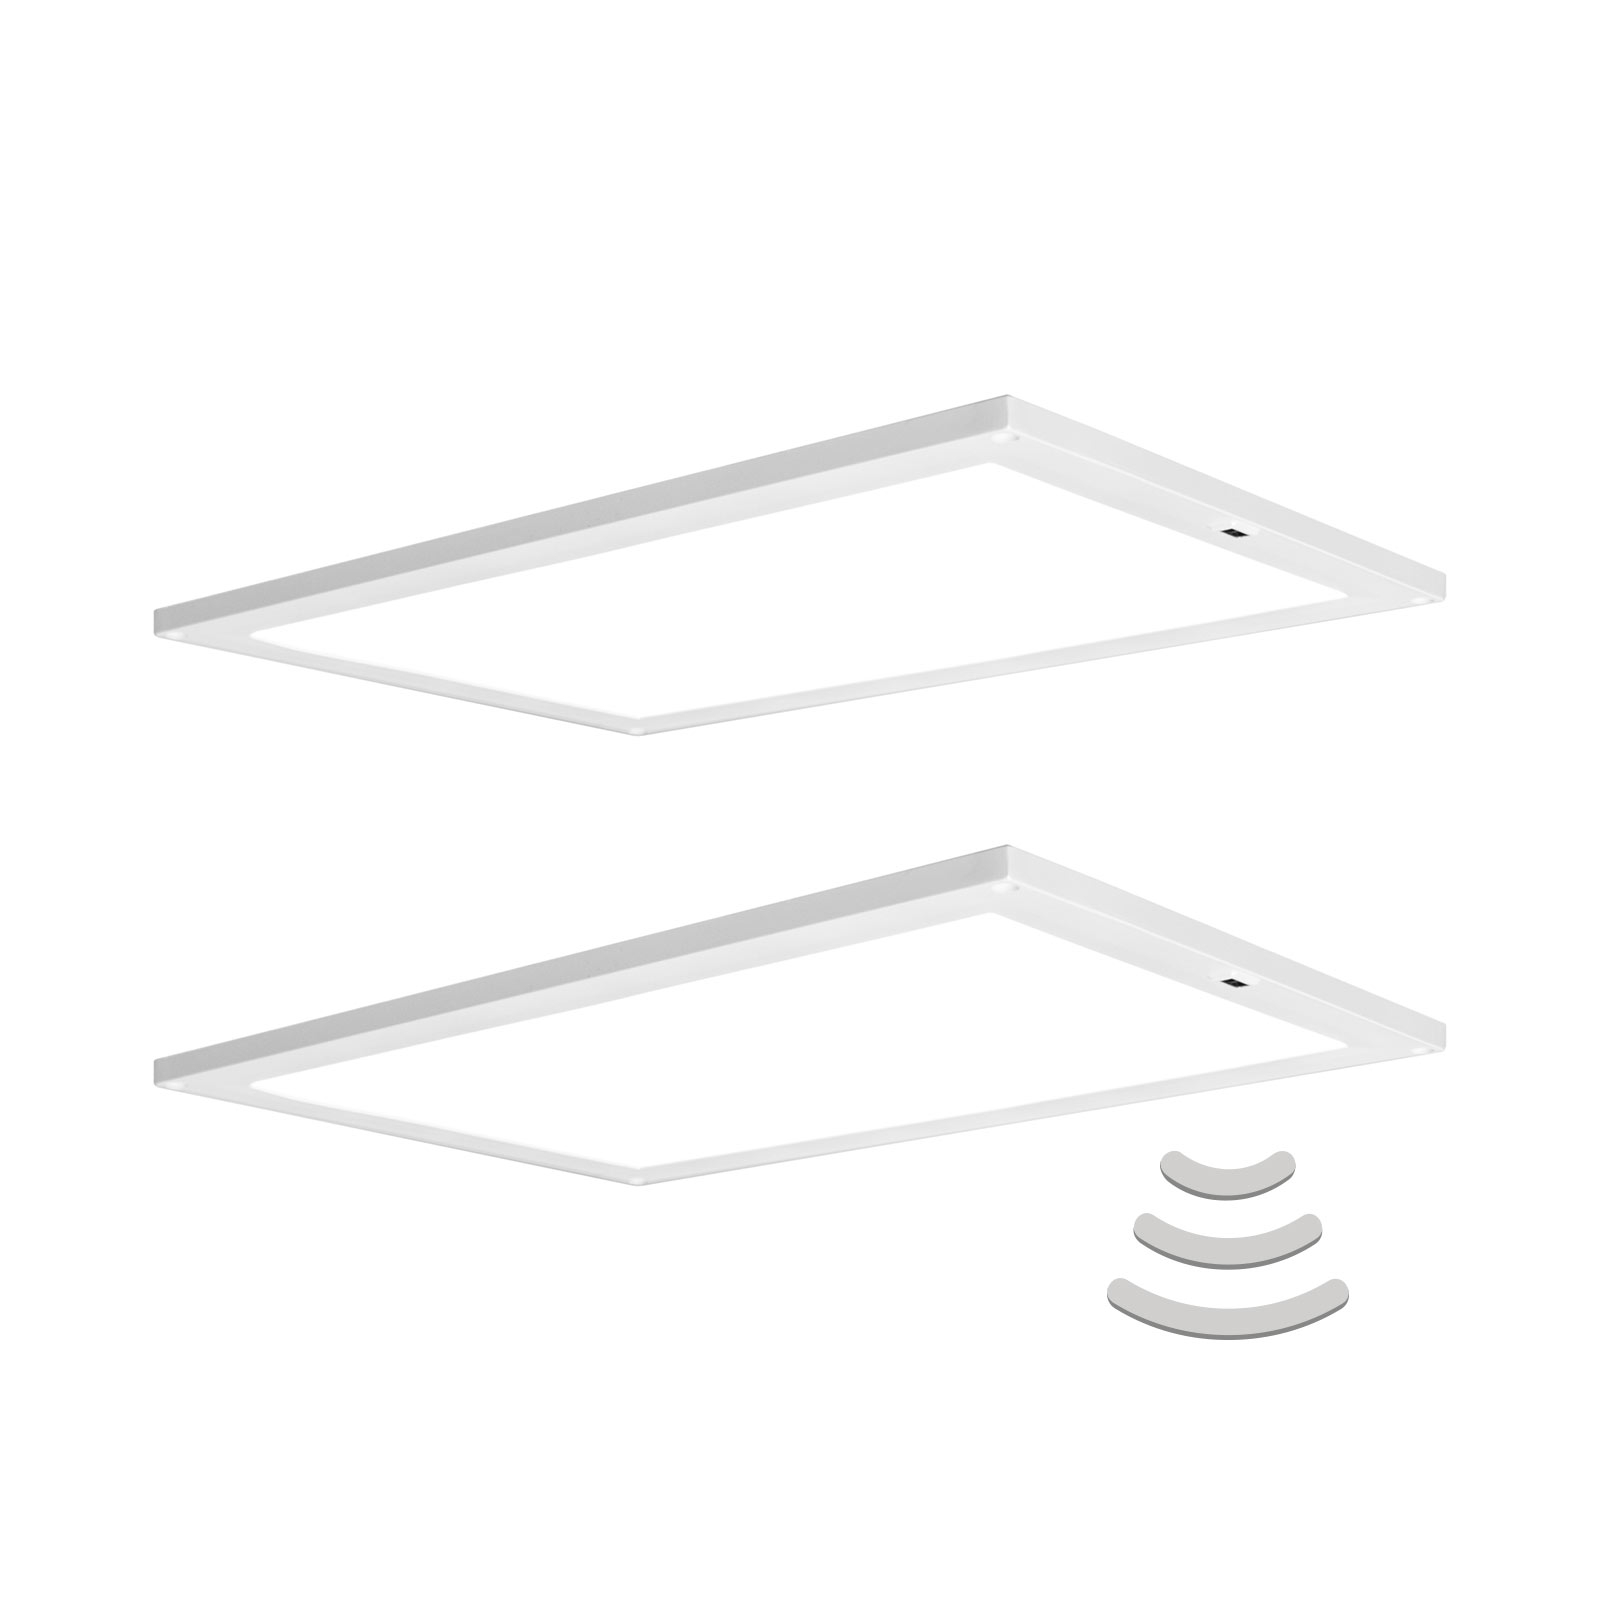 LEDVANCE Cabinet Panel benkarmatur 30x20cm 2er